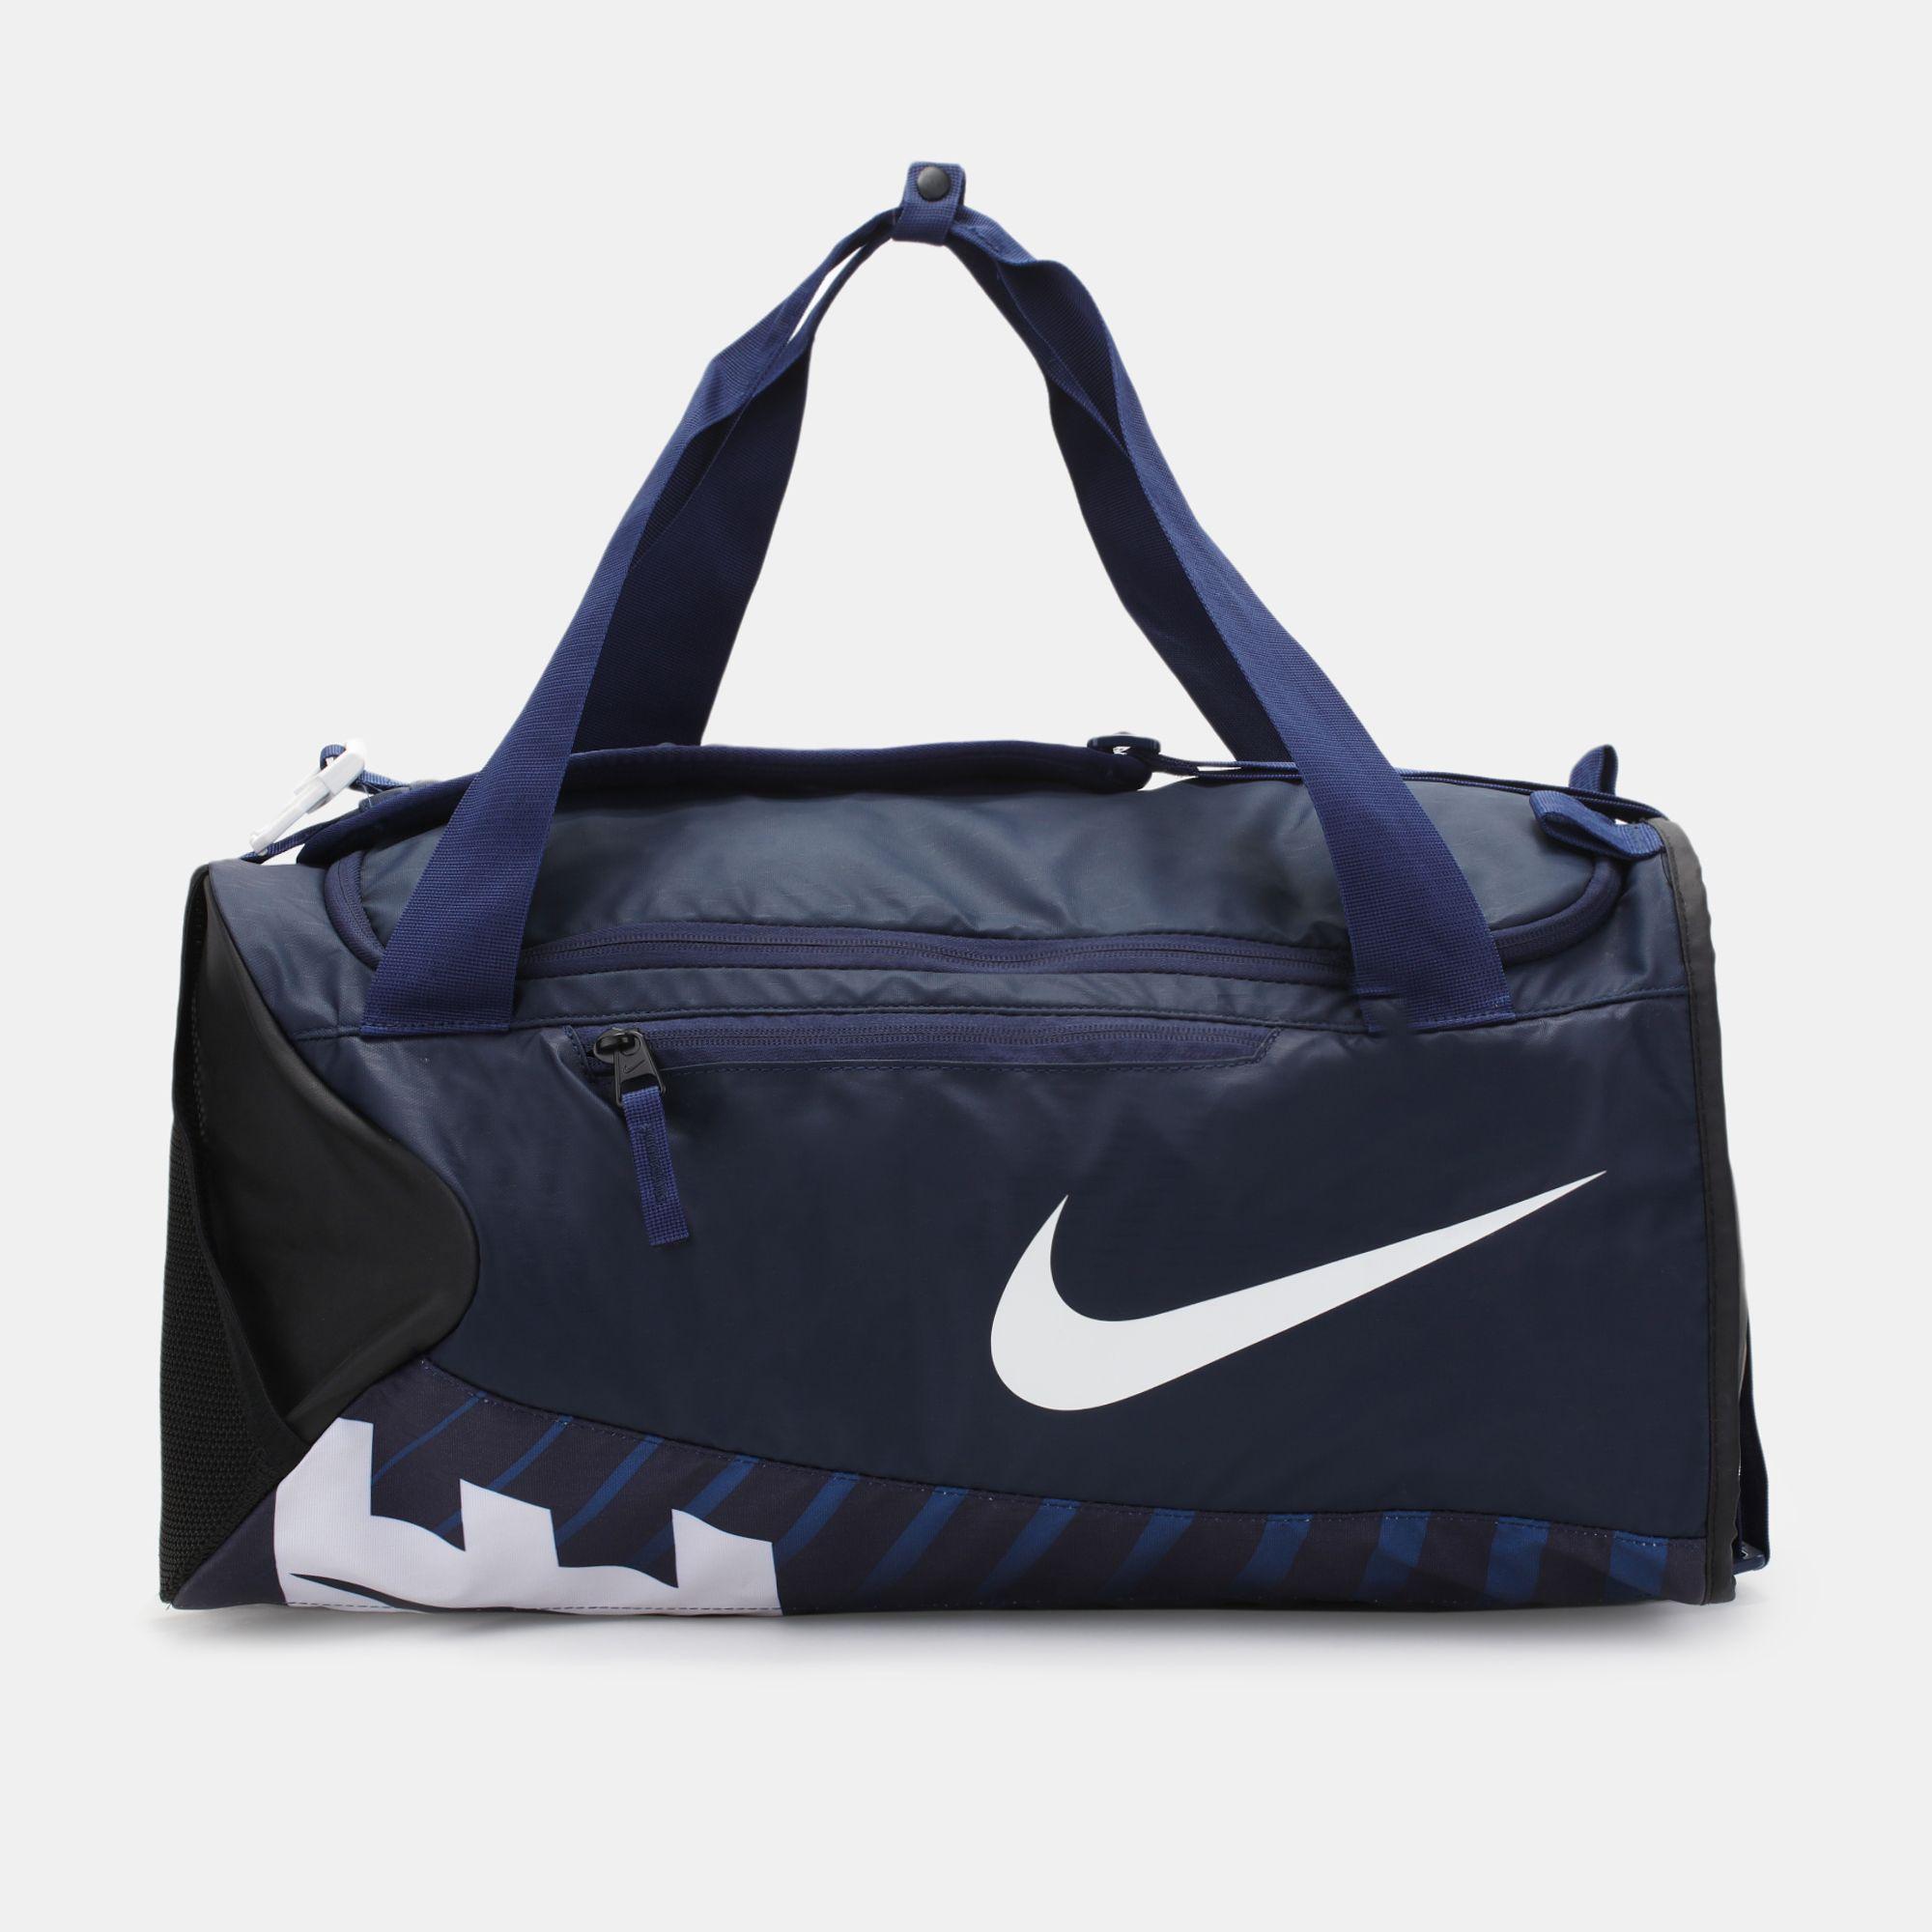 4930b2ce3c91f3 Shop Blue Nike Alpha Adapt Cross Body Duffel Bag for Mens by Please ...